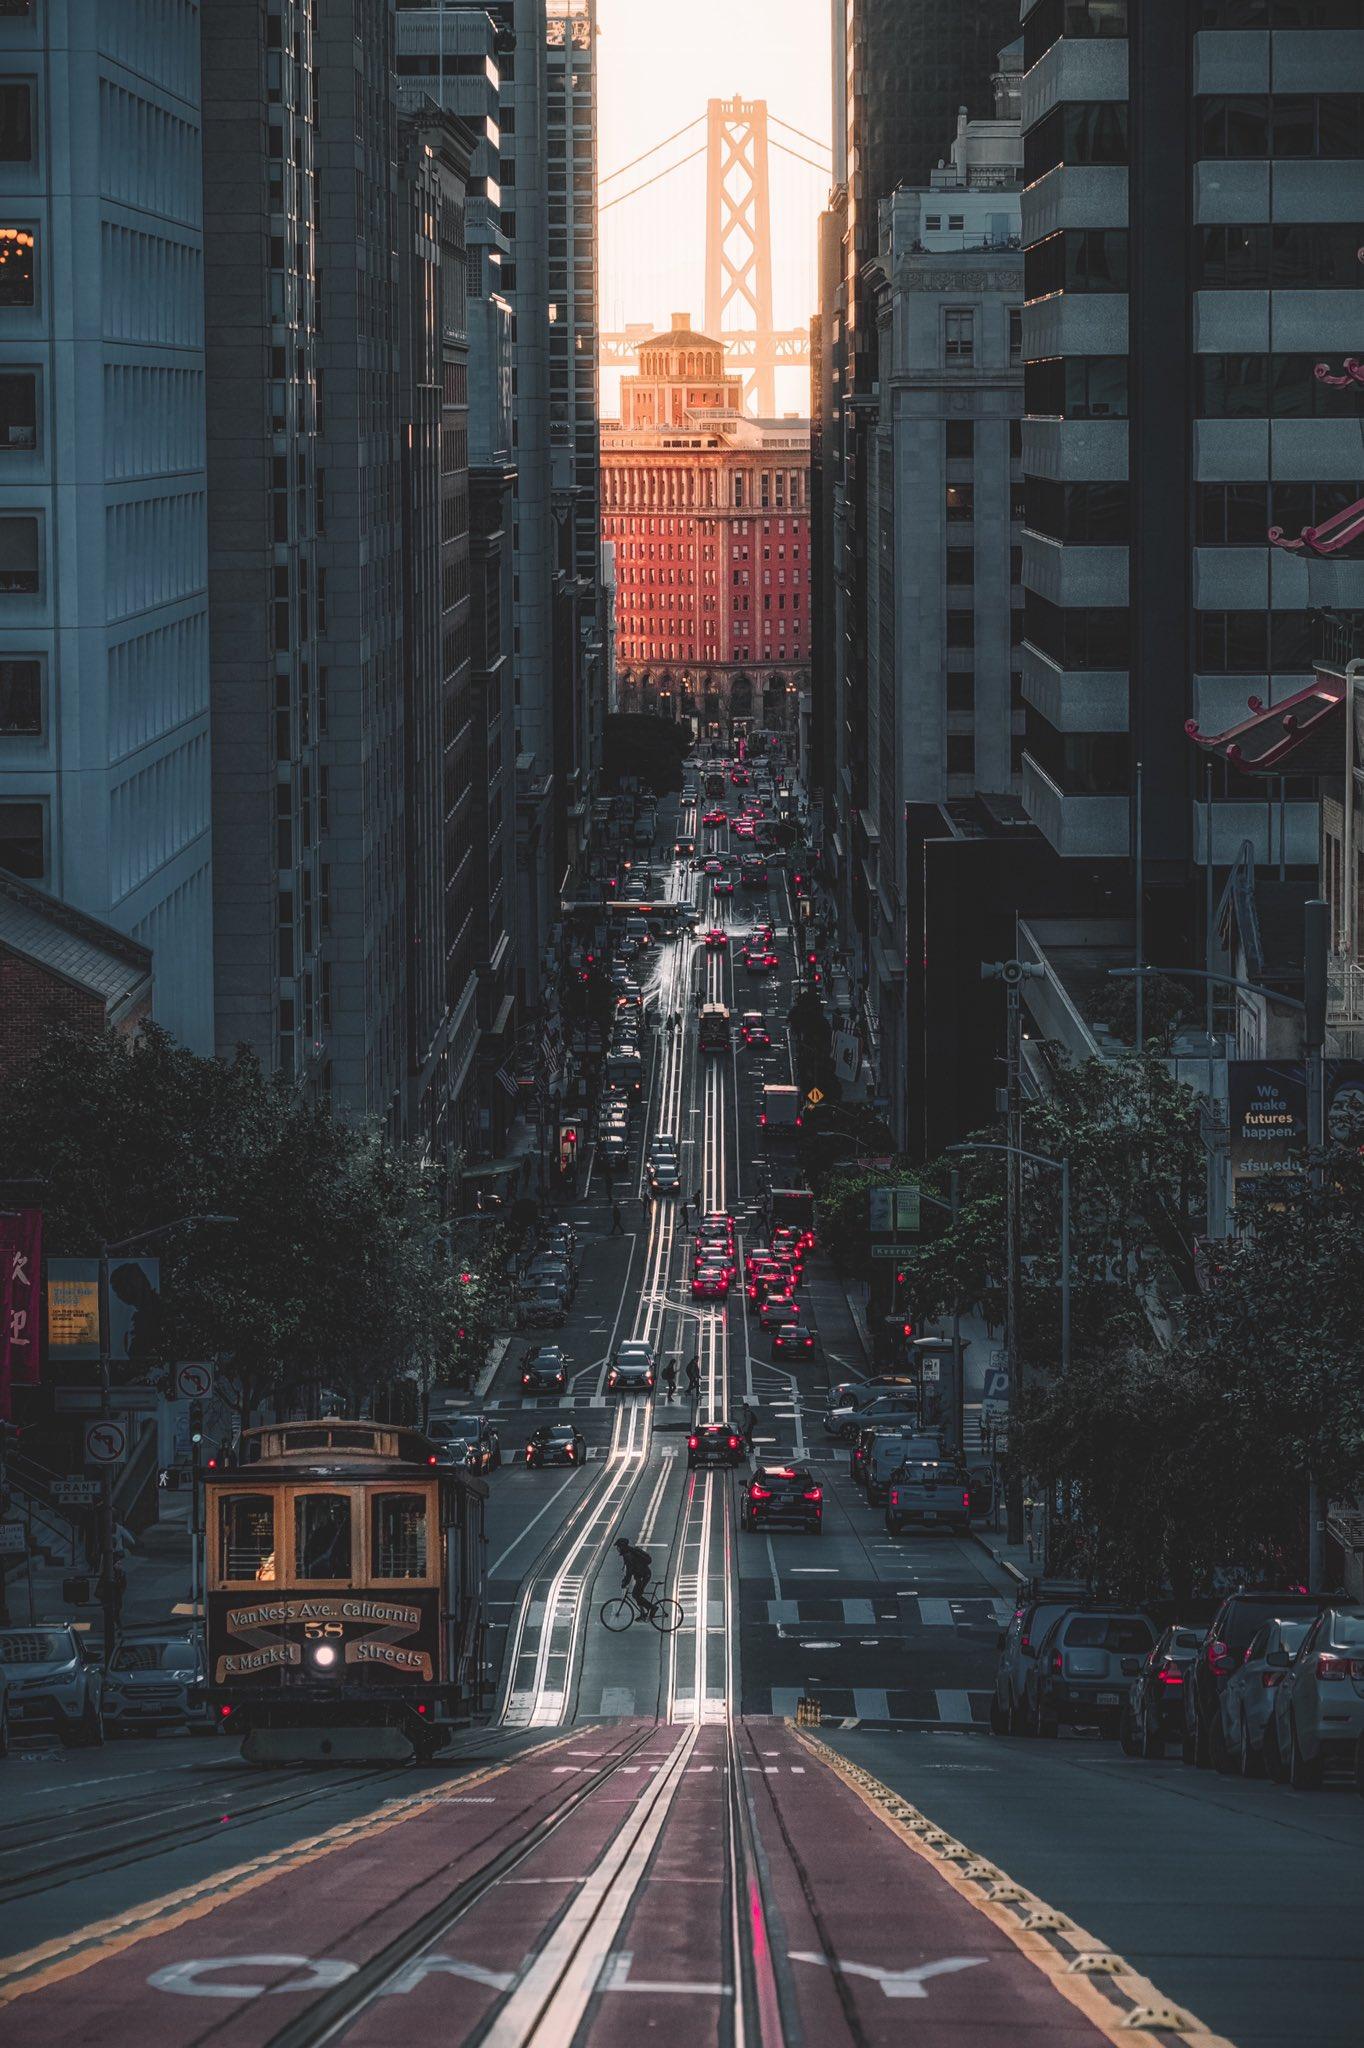 urban_street_photography_37.jpg